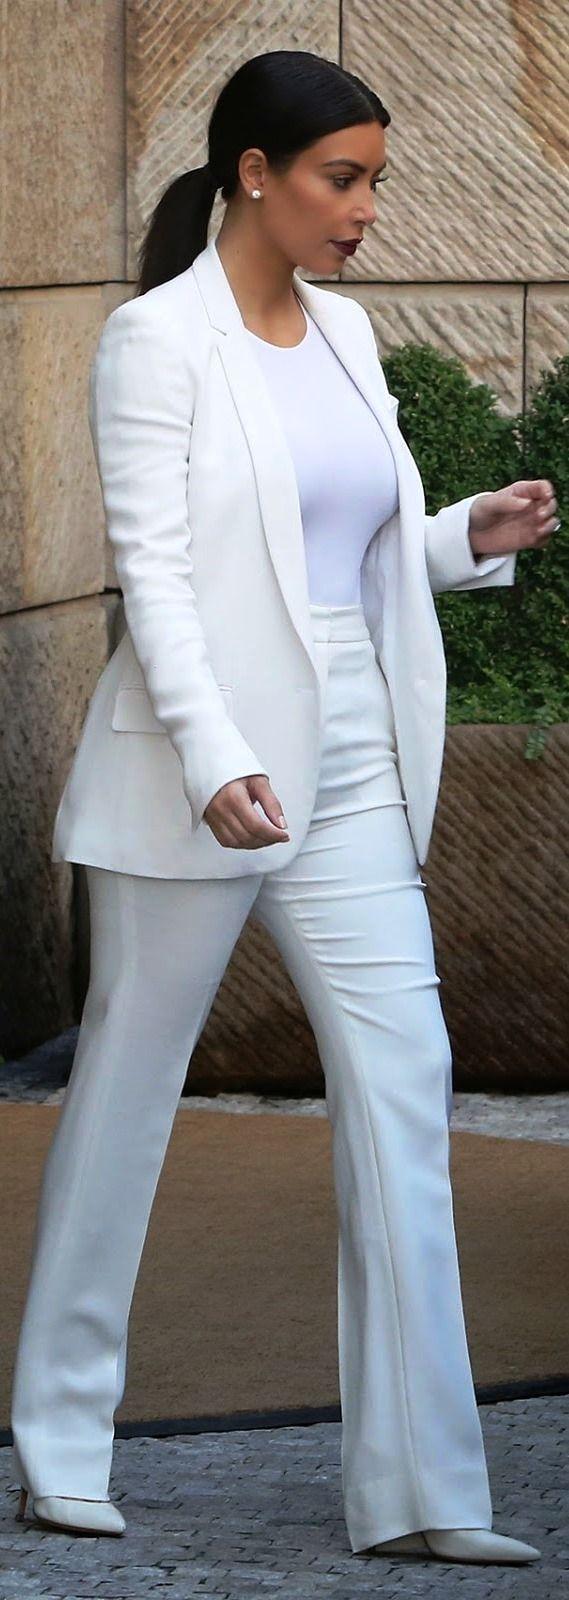 kim kardashian business attire